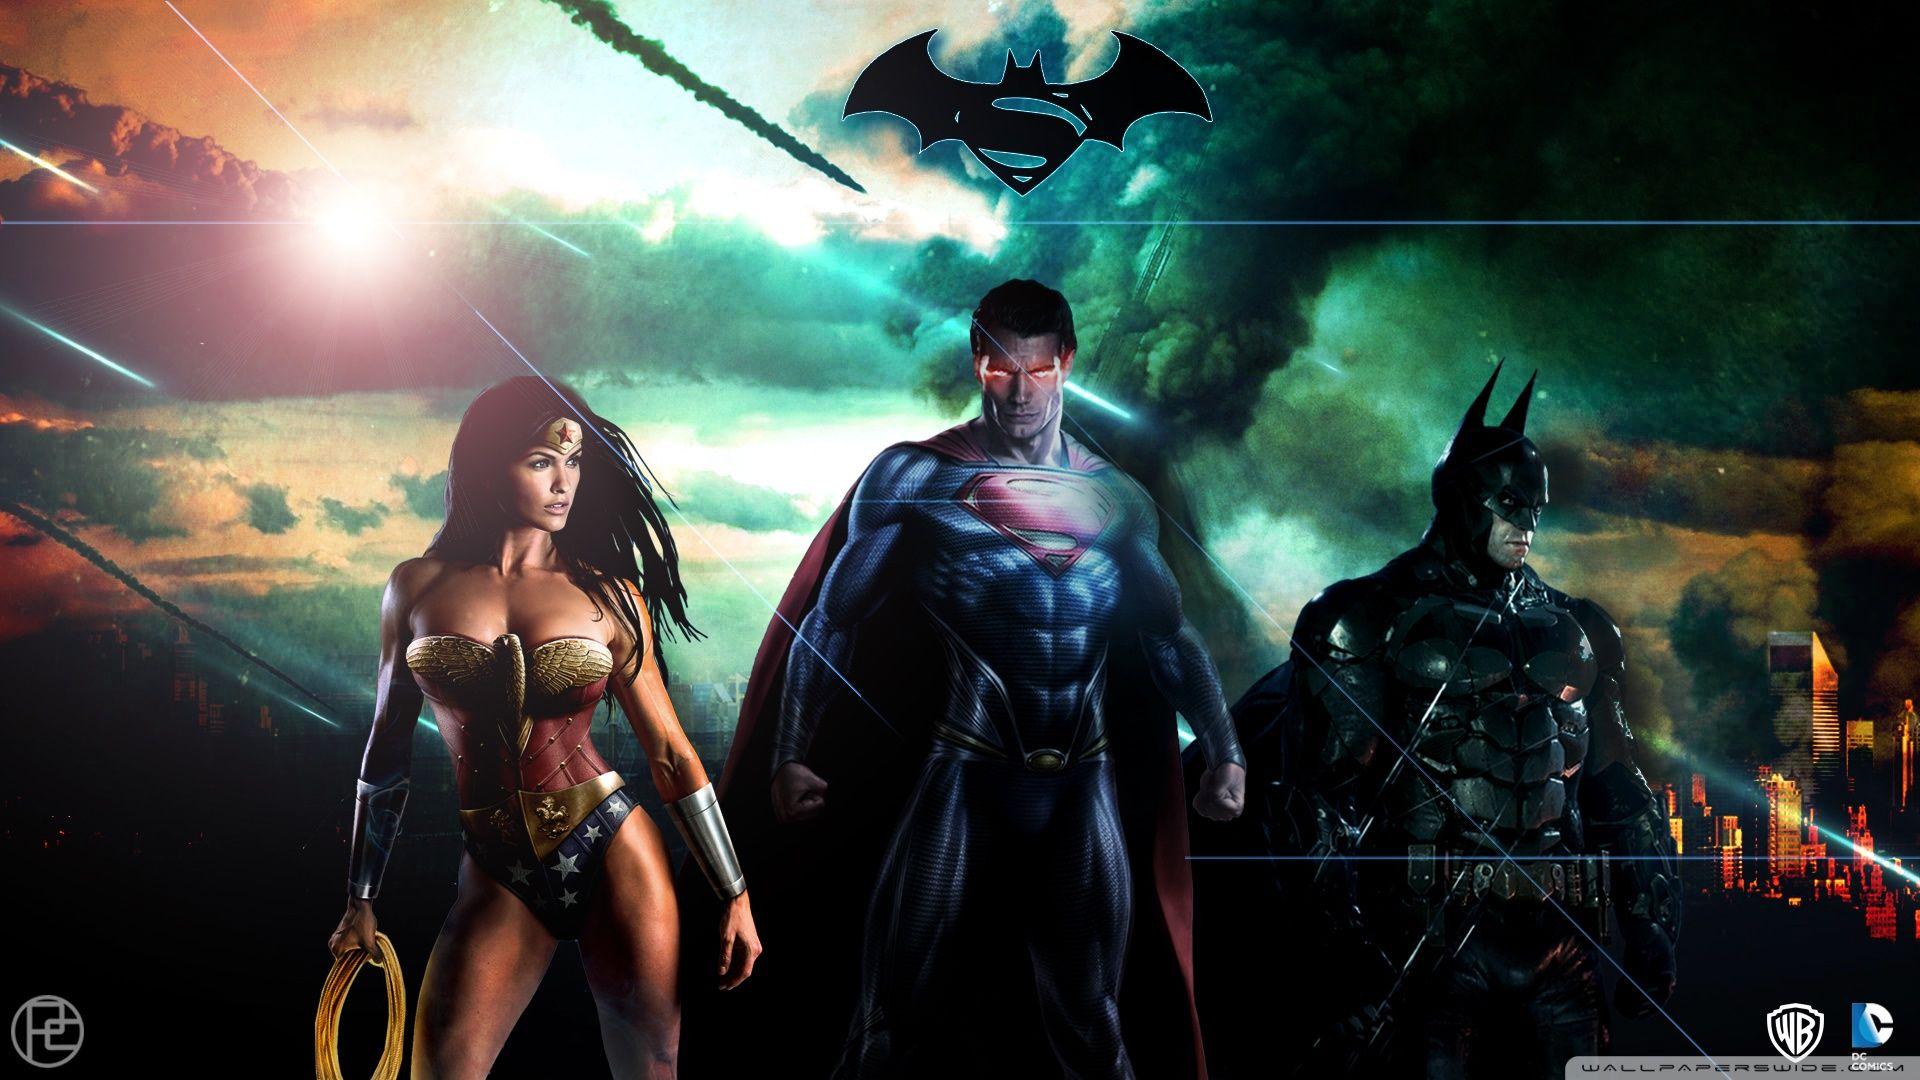 Wonder Woman And Superman Hd Wallpaper Google Search Wonder